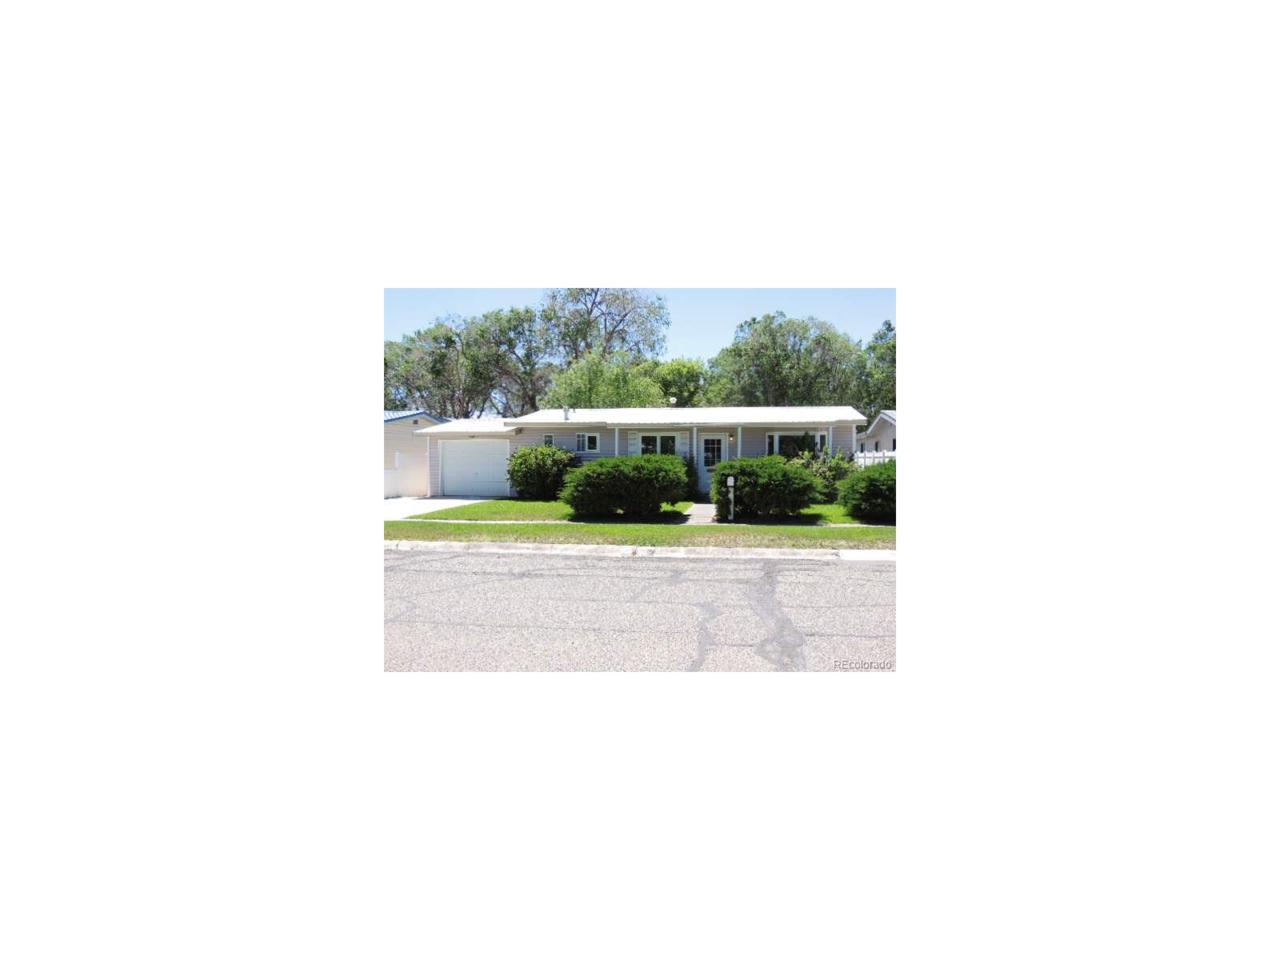 1207 La Due Avenue, Alamosa, CO 81101 (MLS #7105859) :: 8z Real Estate